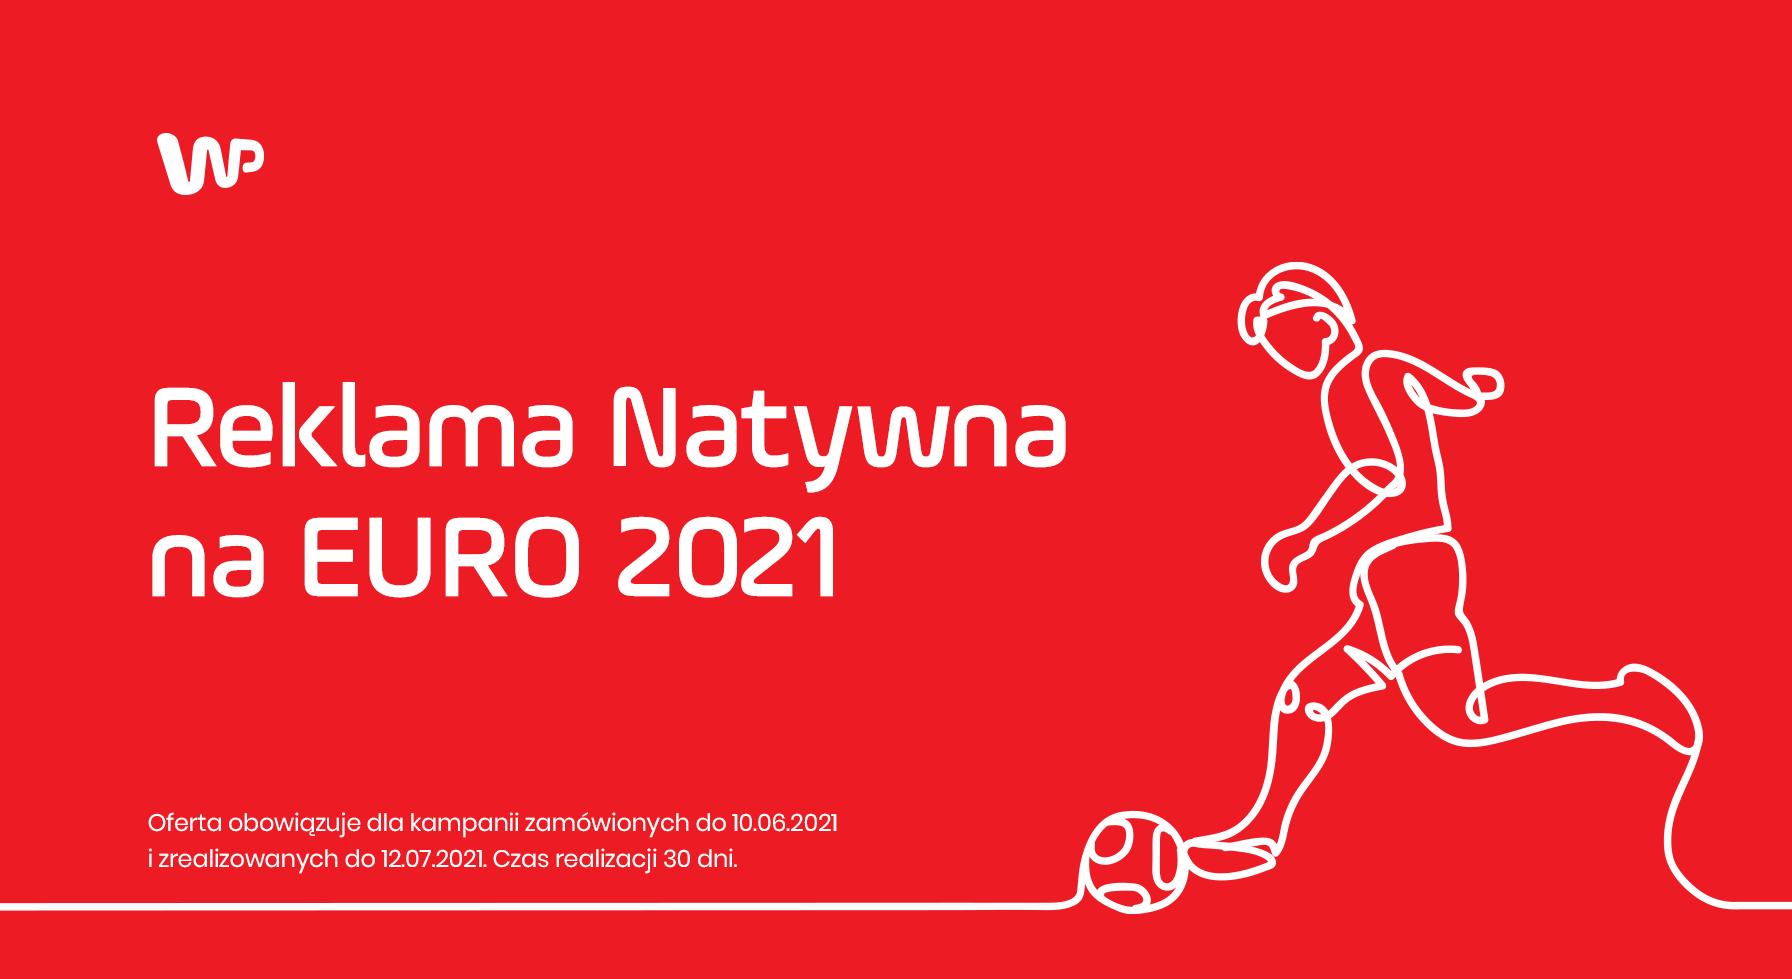 Reklama Natywna na Euro 2021